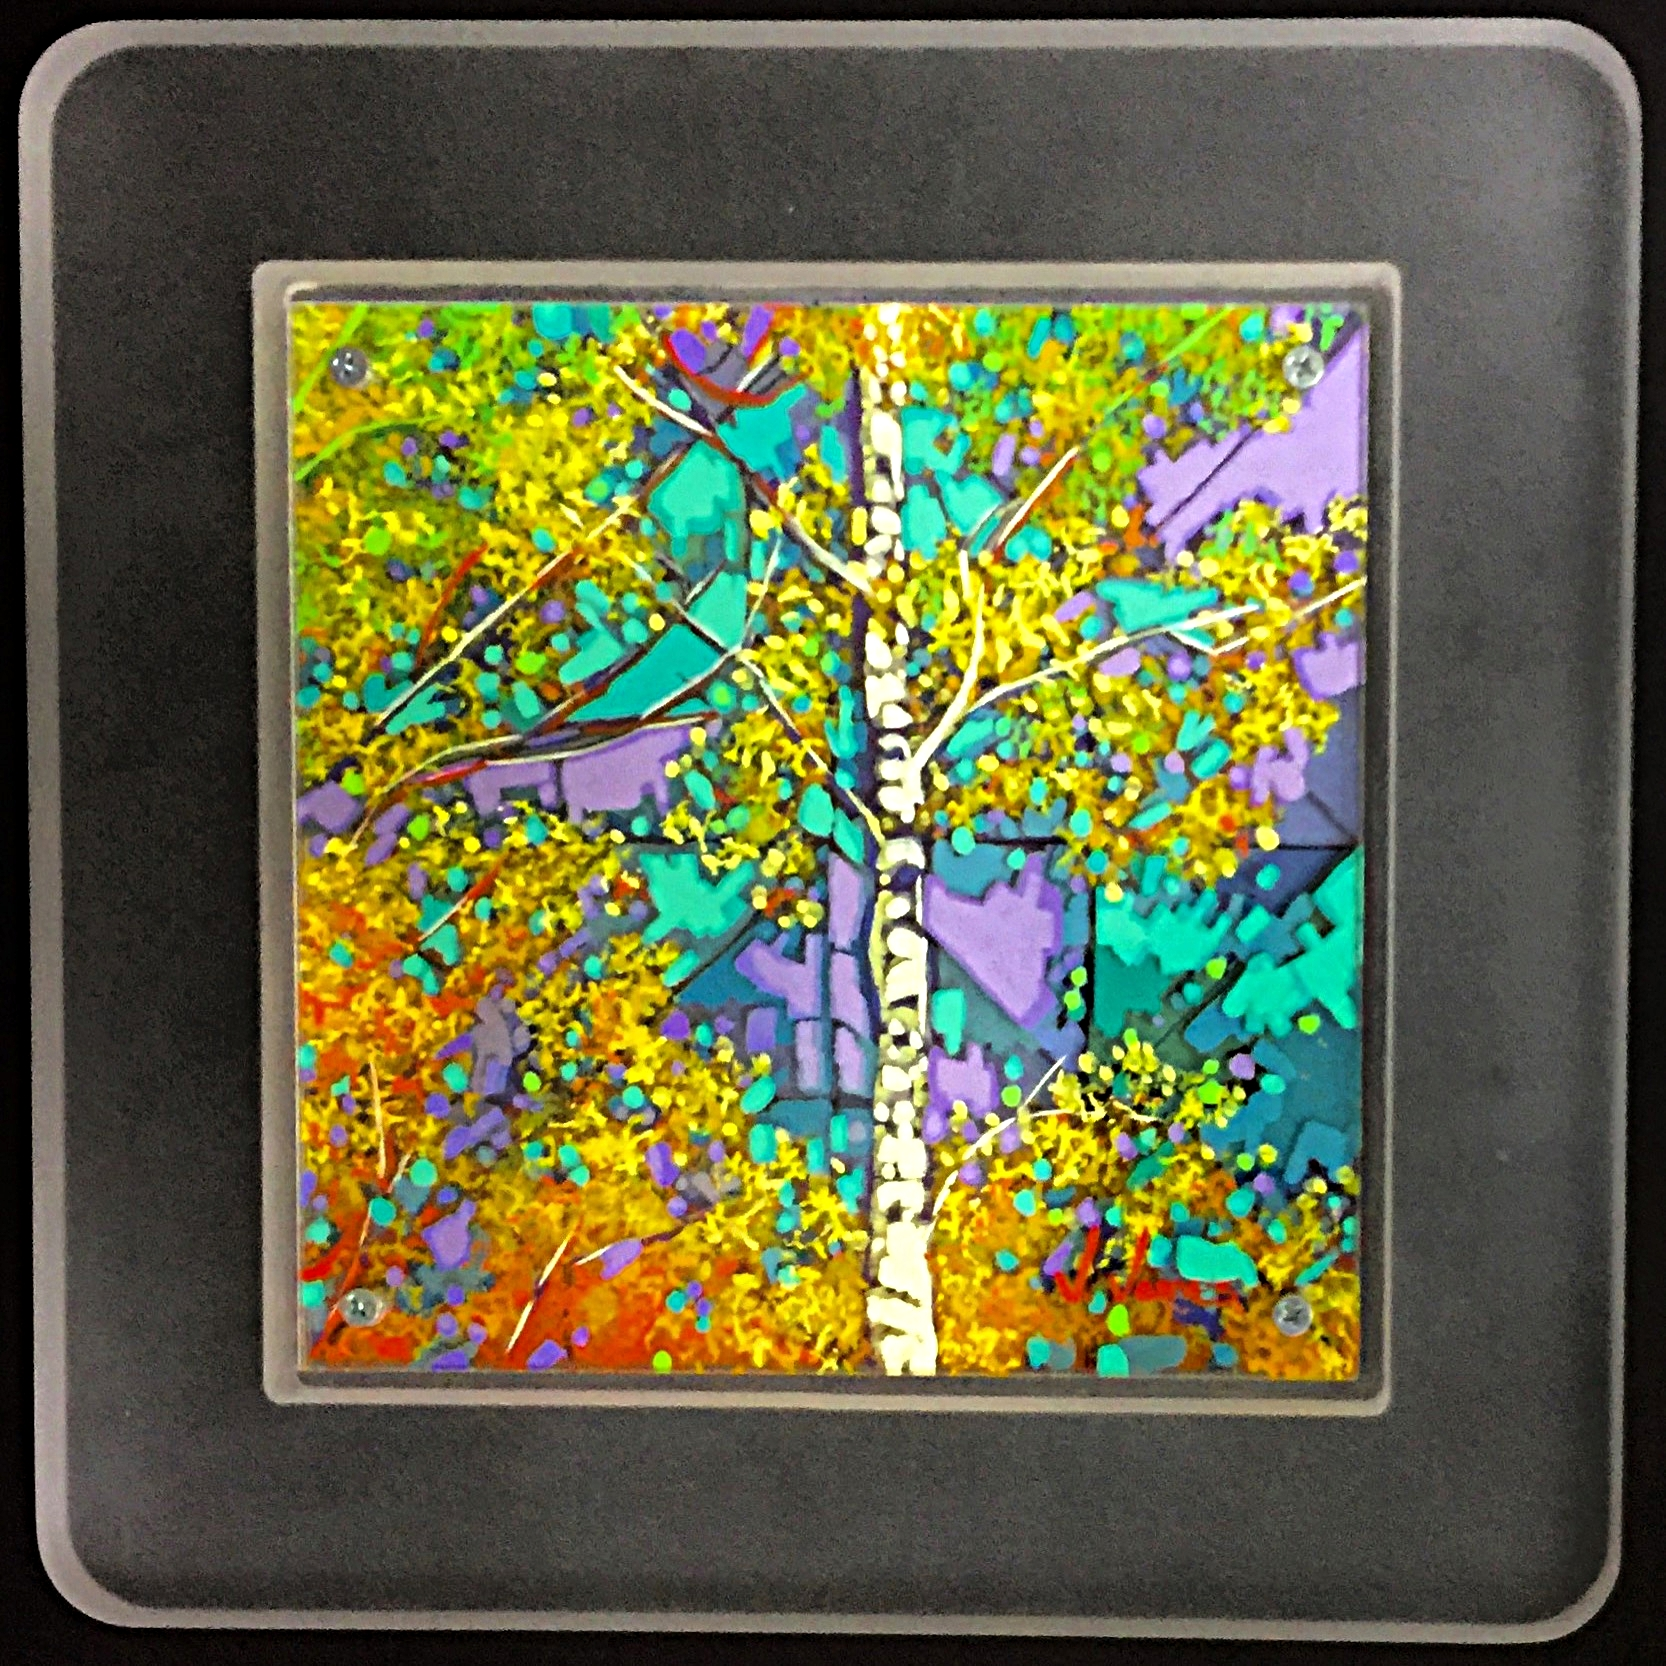 "Sun Dance, 8"" x 8"" Acrylic on Multi-Layered Acrylic Glass"